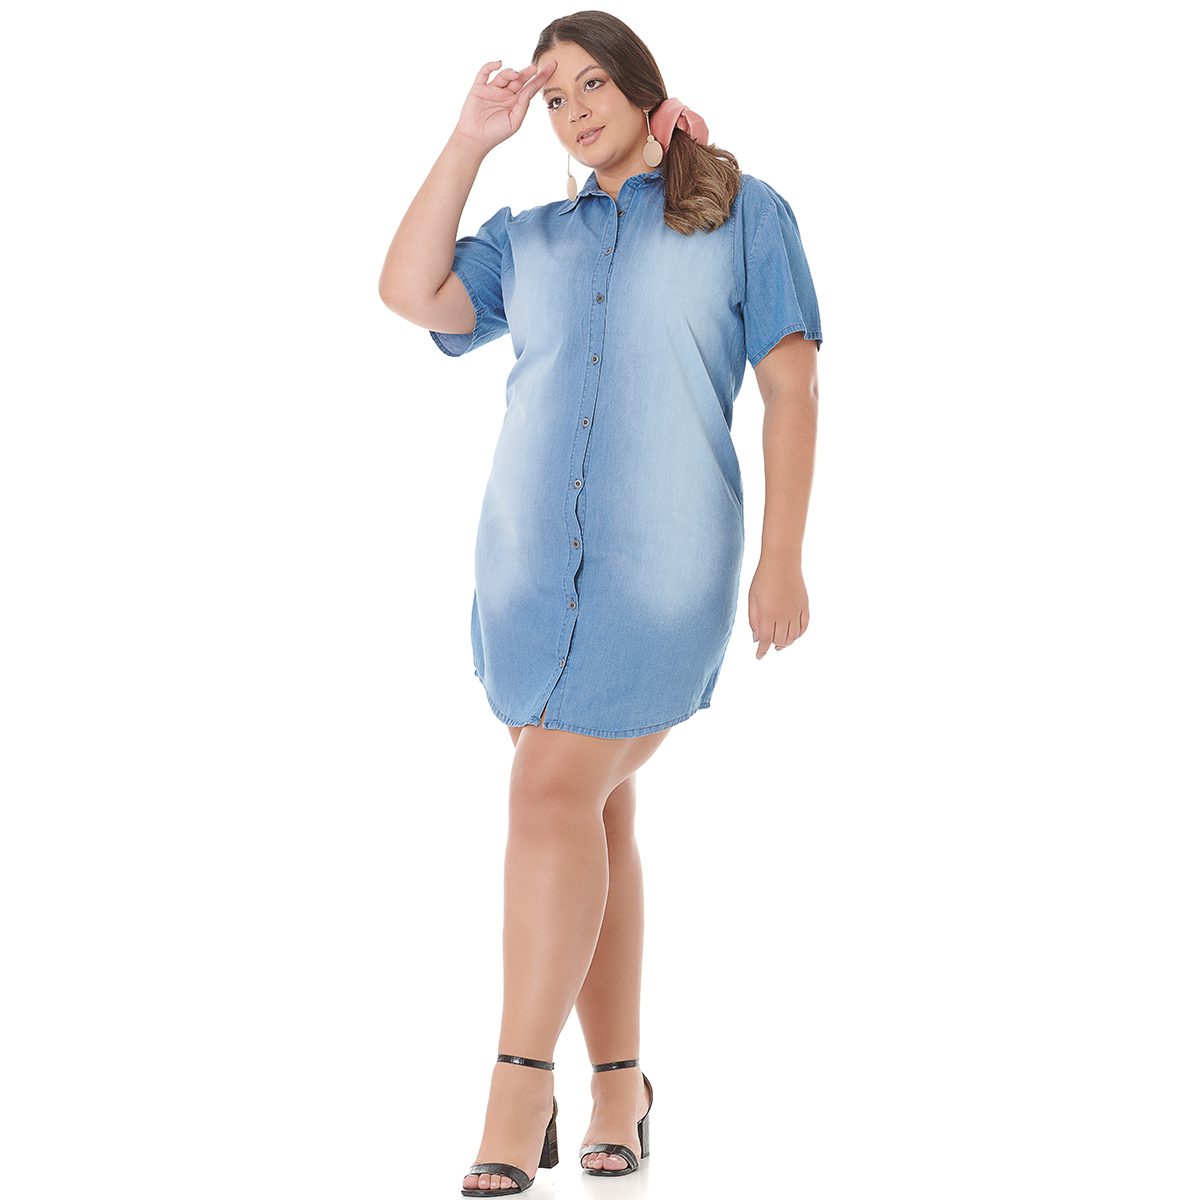 Vestido Plus Size Feminino Jeans 4000